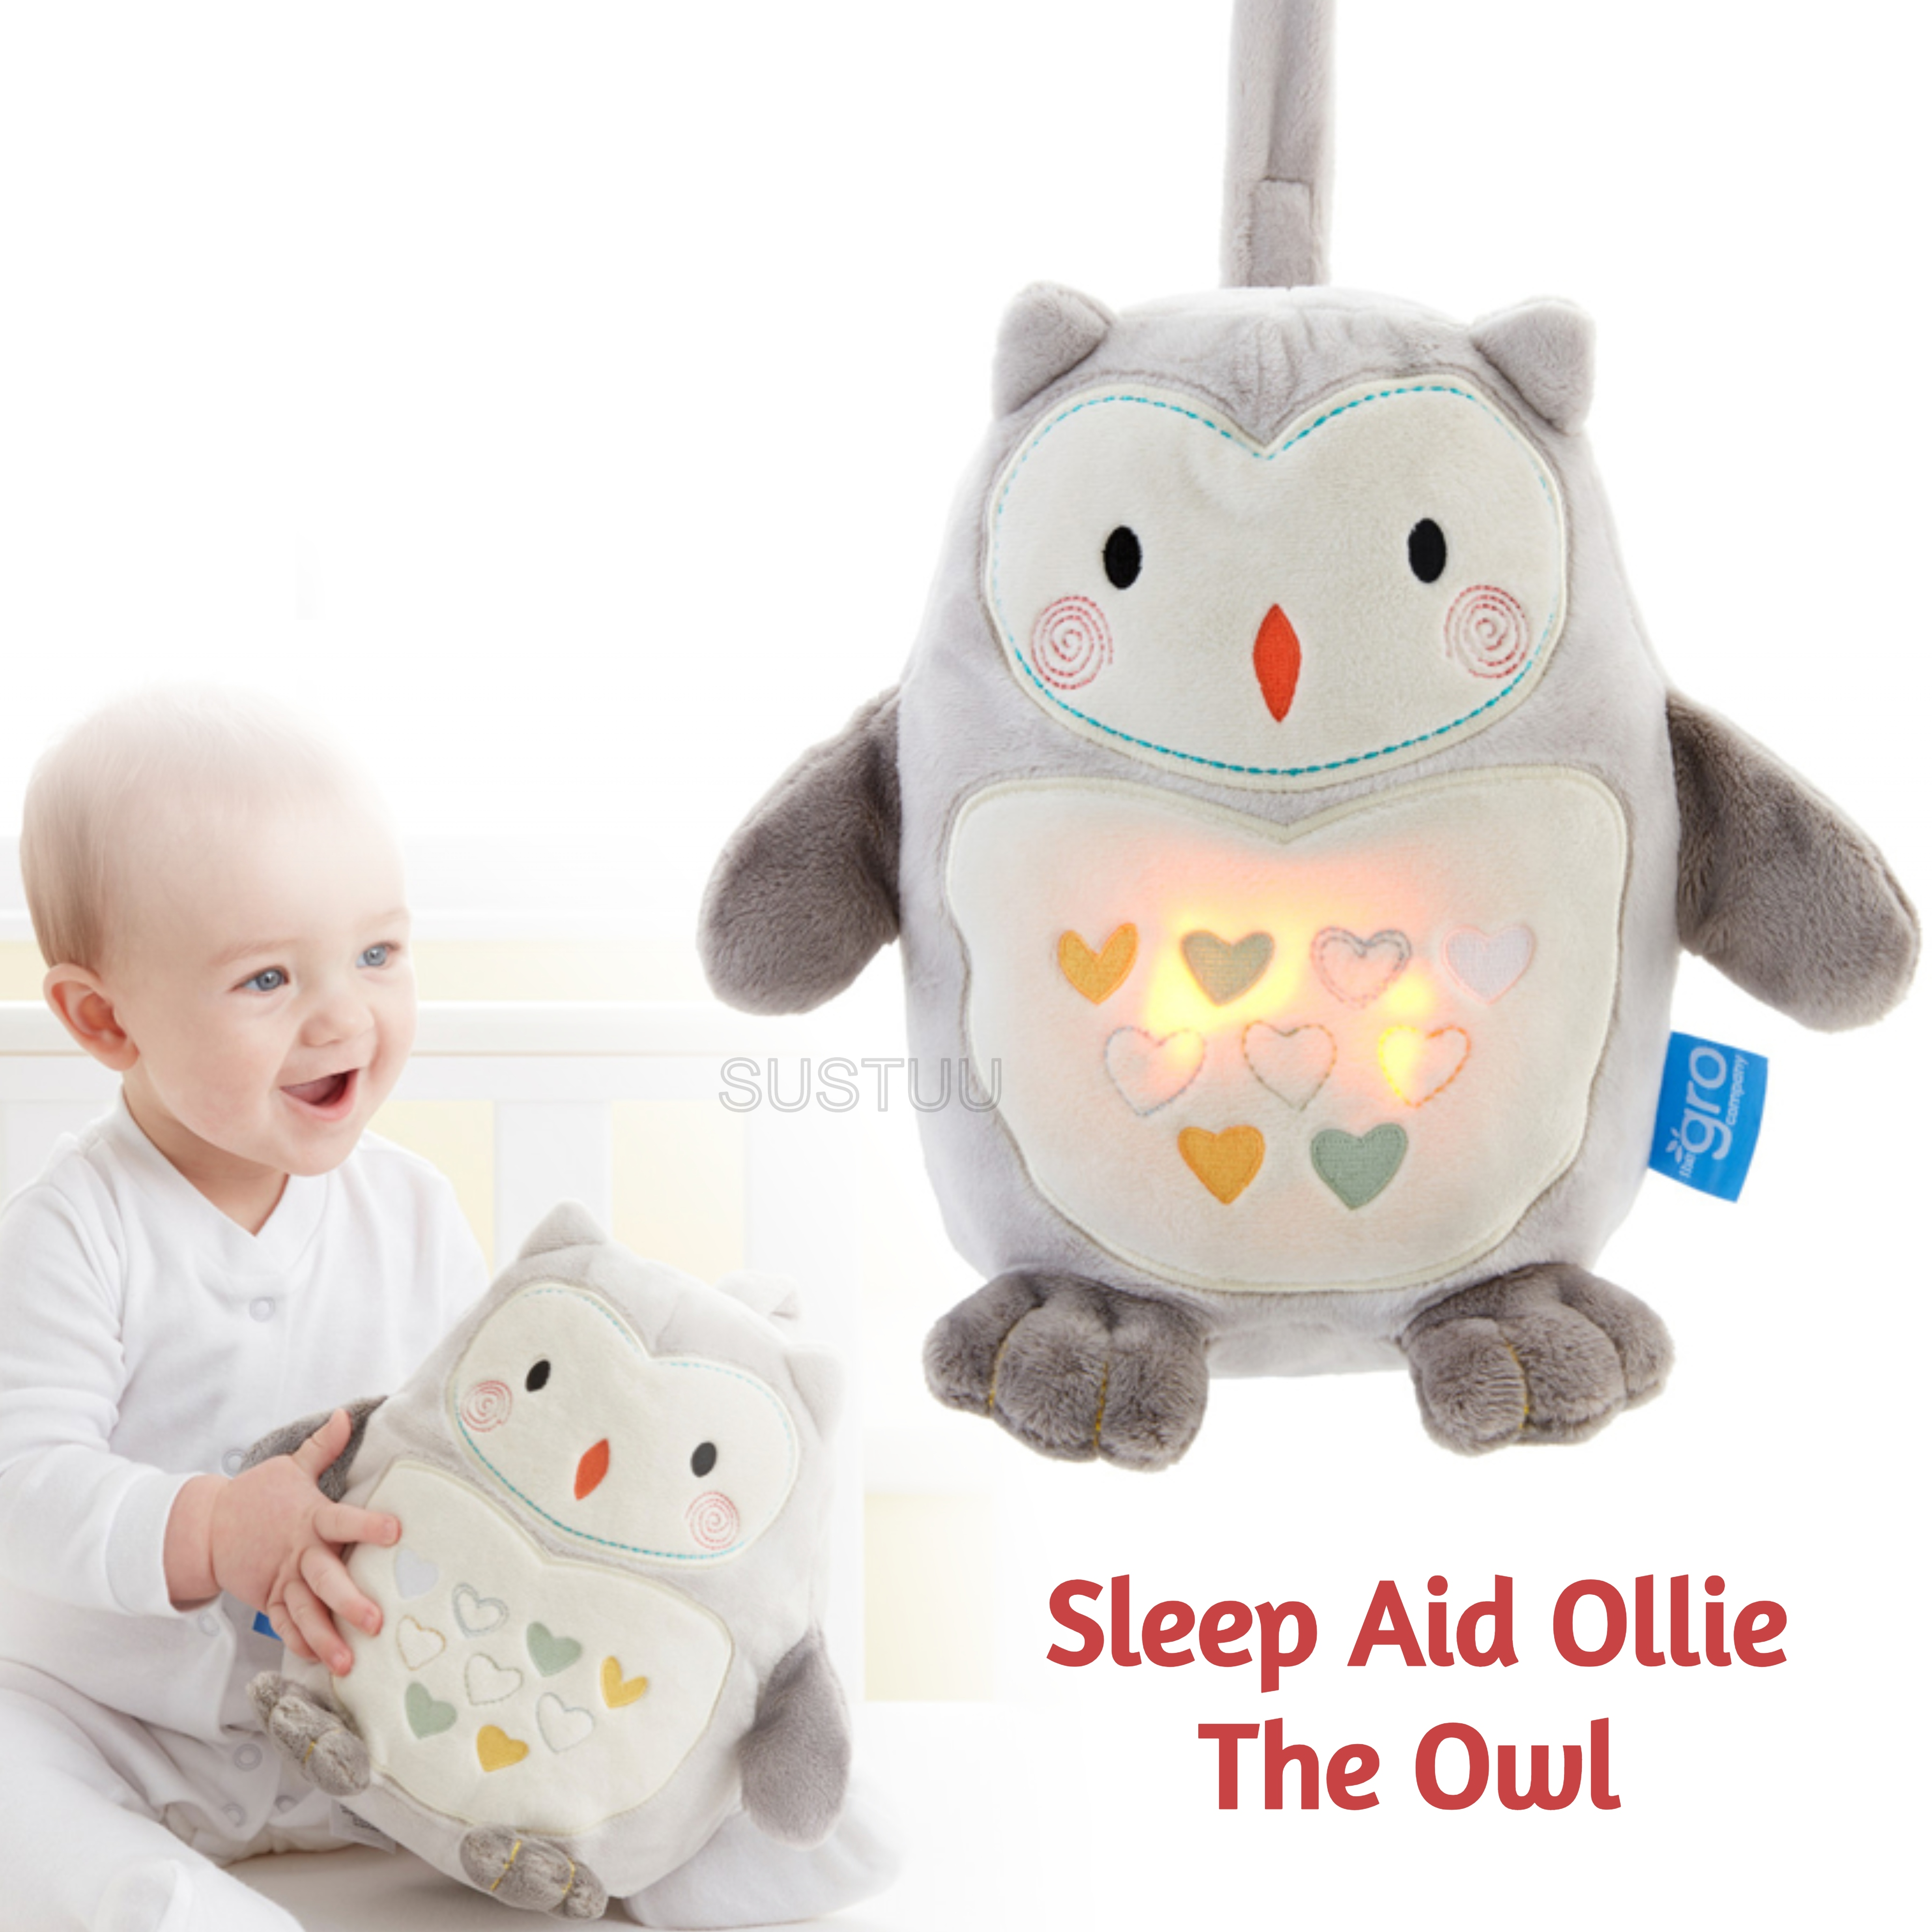 GroFriends Sleep Aid Ollie the Owl | Kid's Comfort Sleeping Toy | Light-Sound Sleep